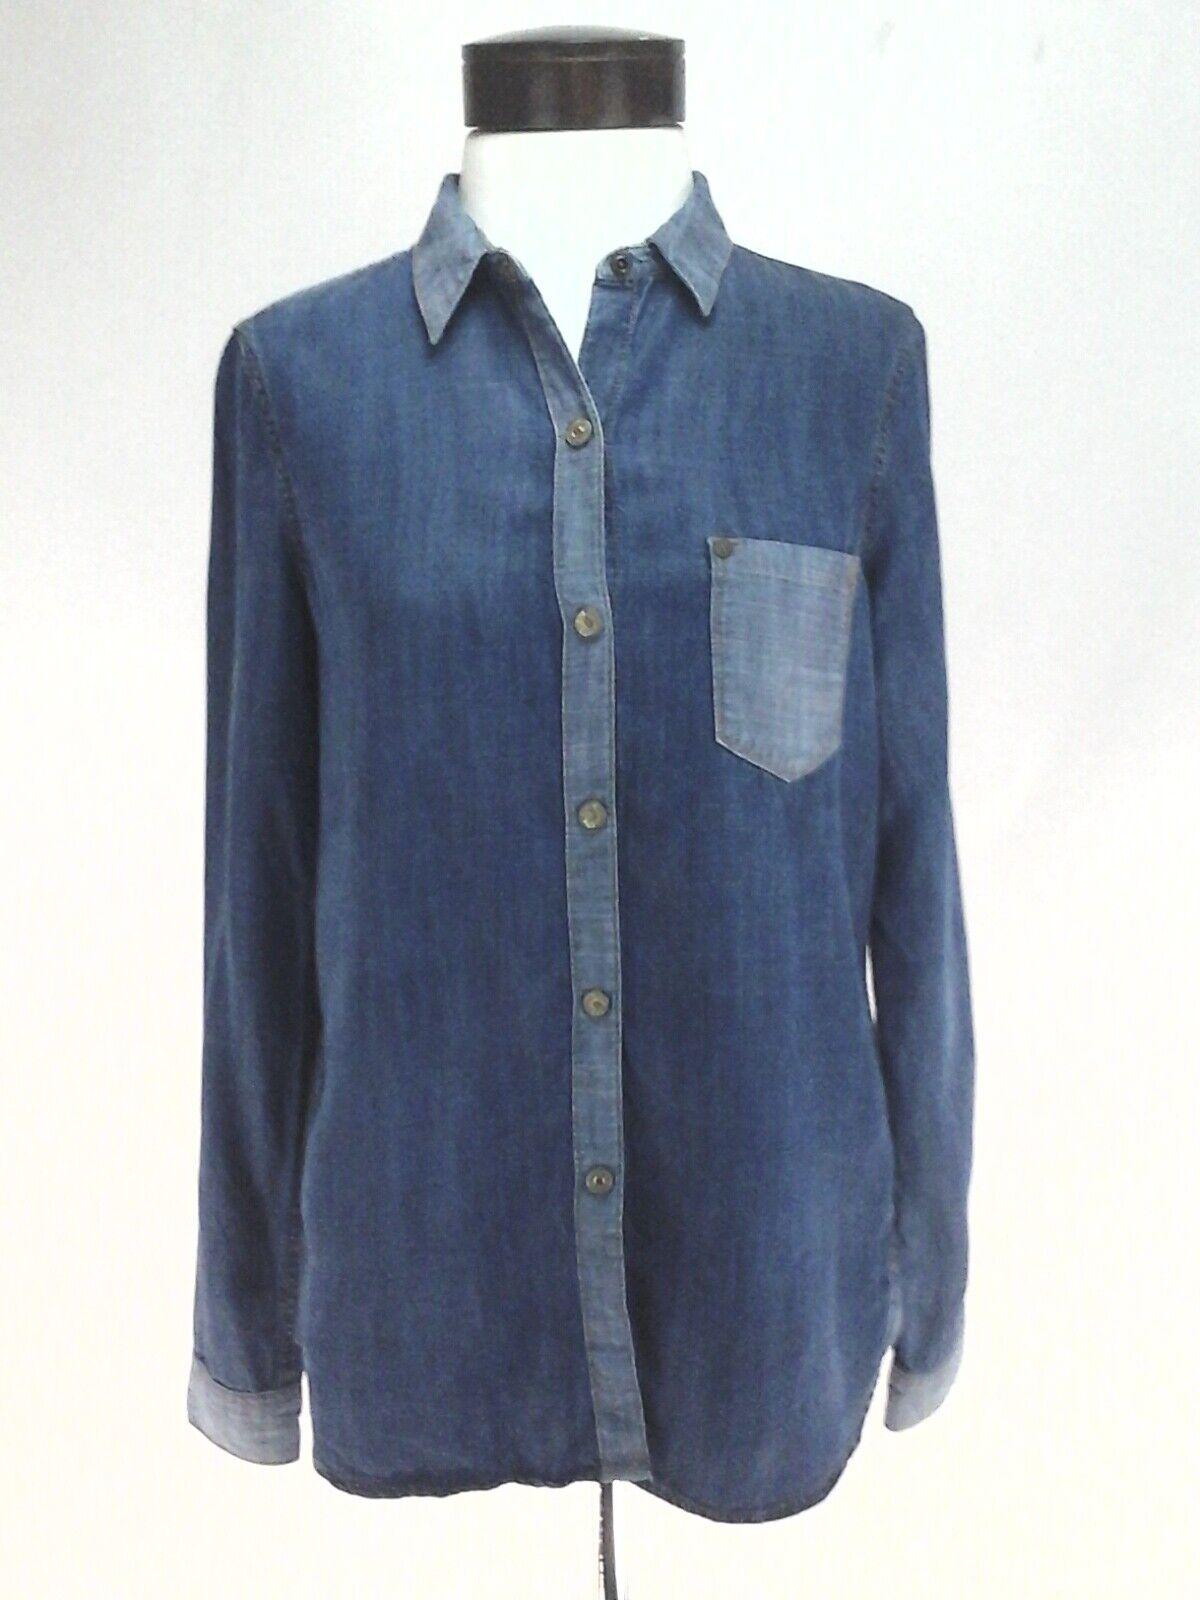 7 for all Mankind Tencel Denim Look Shirt Two Tone Blau Top Woherren S  RARE